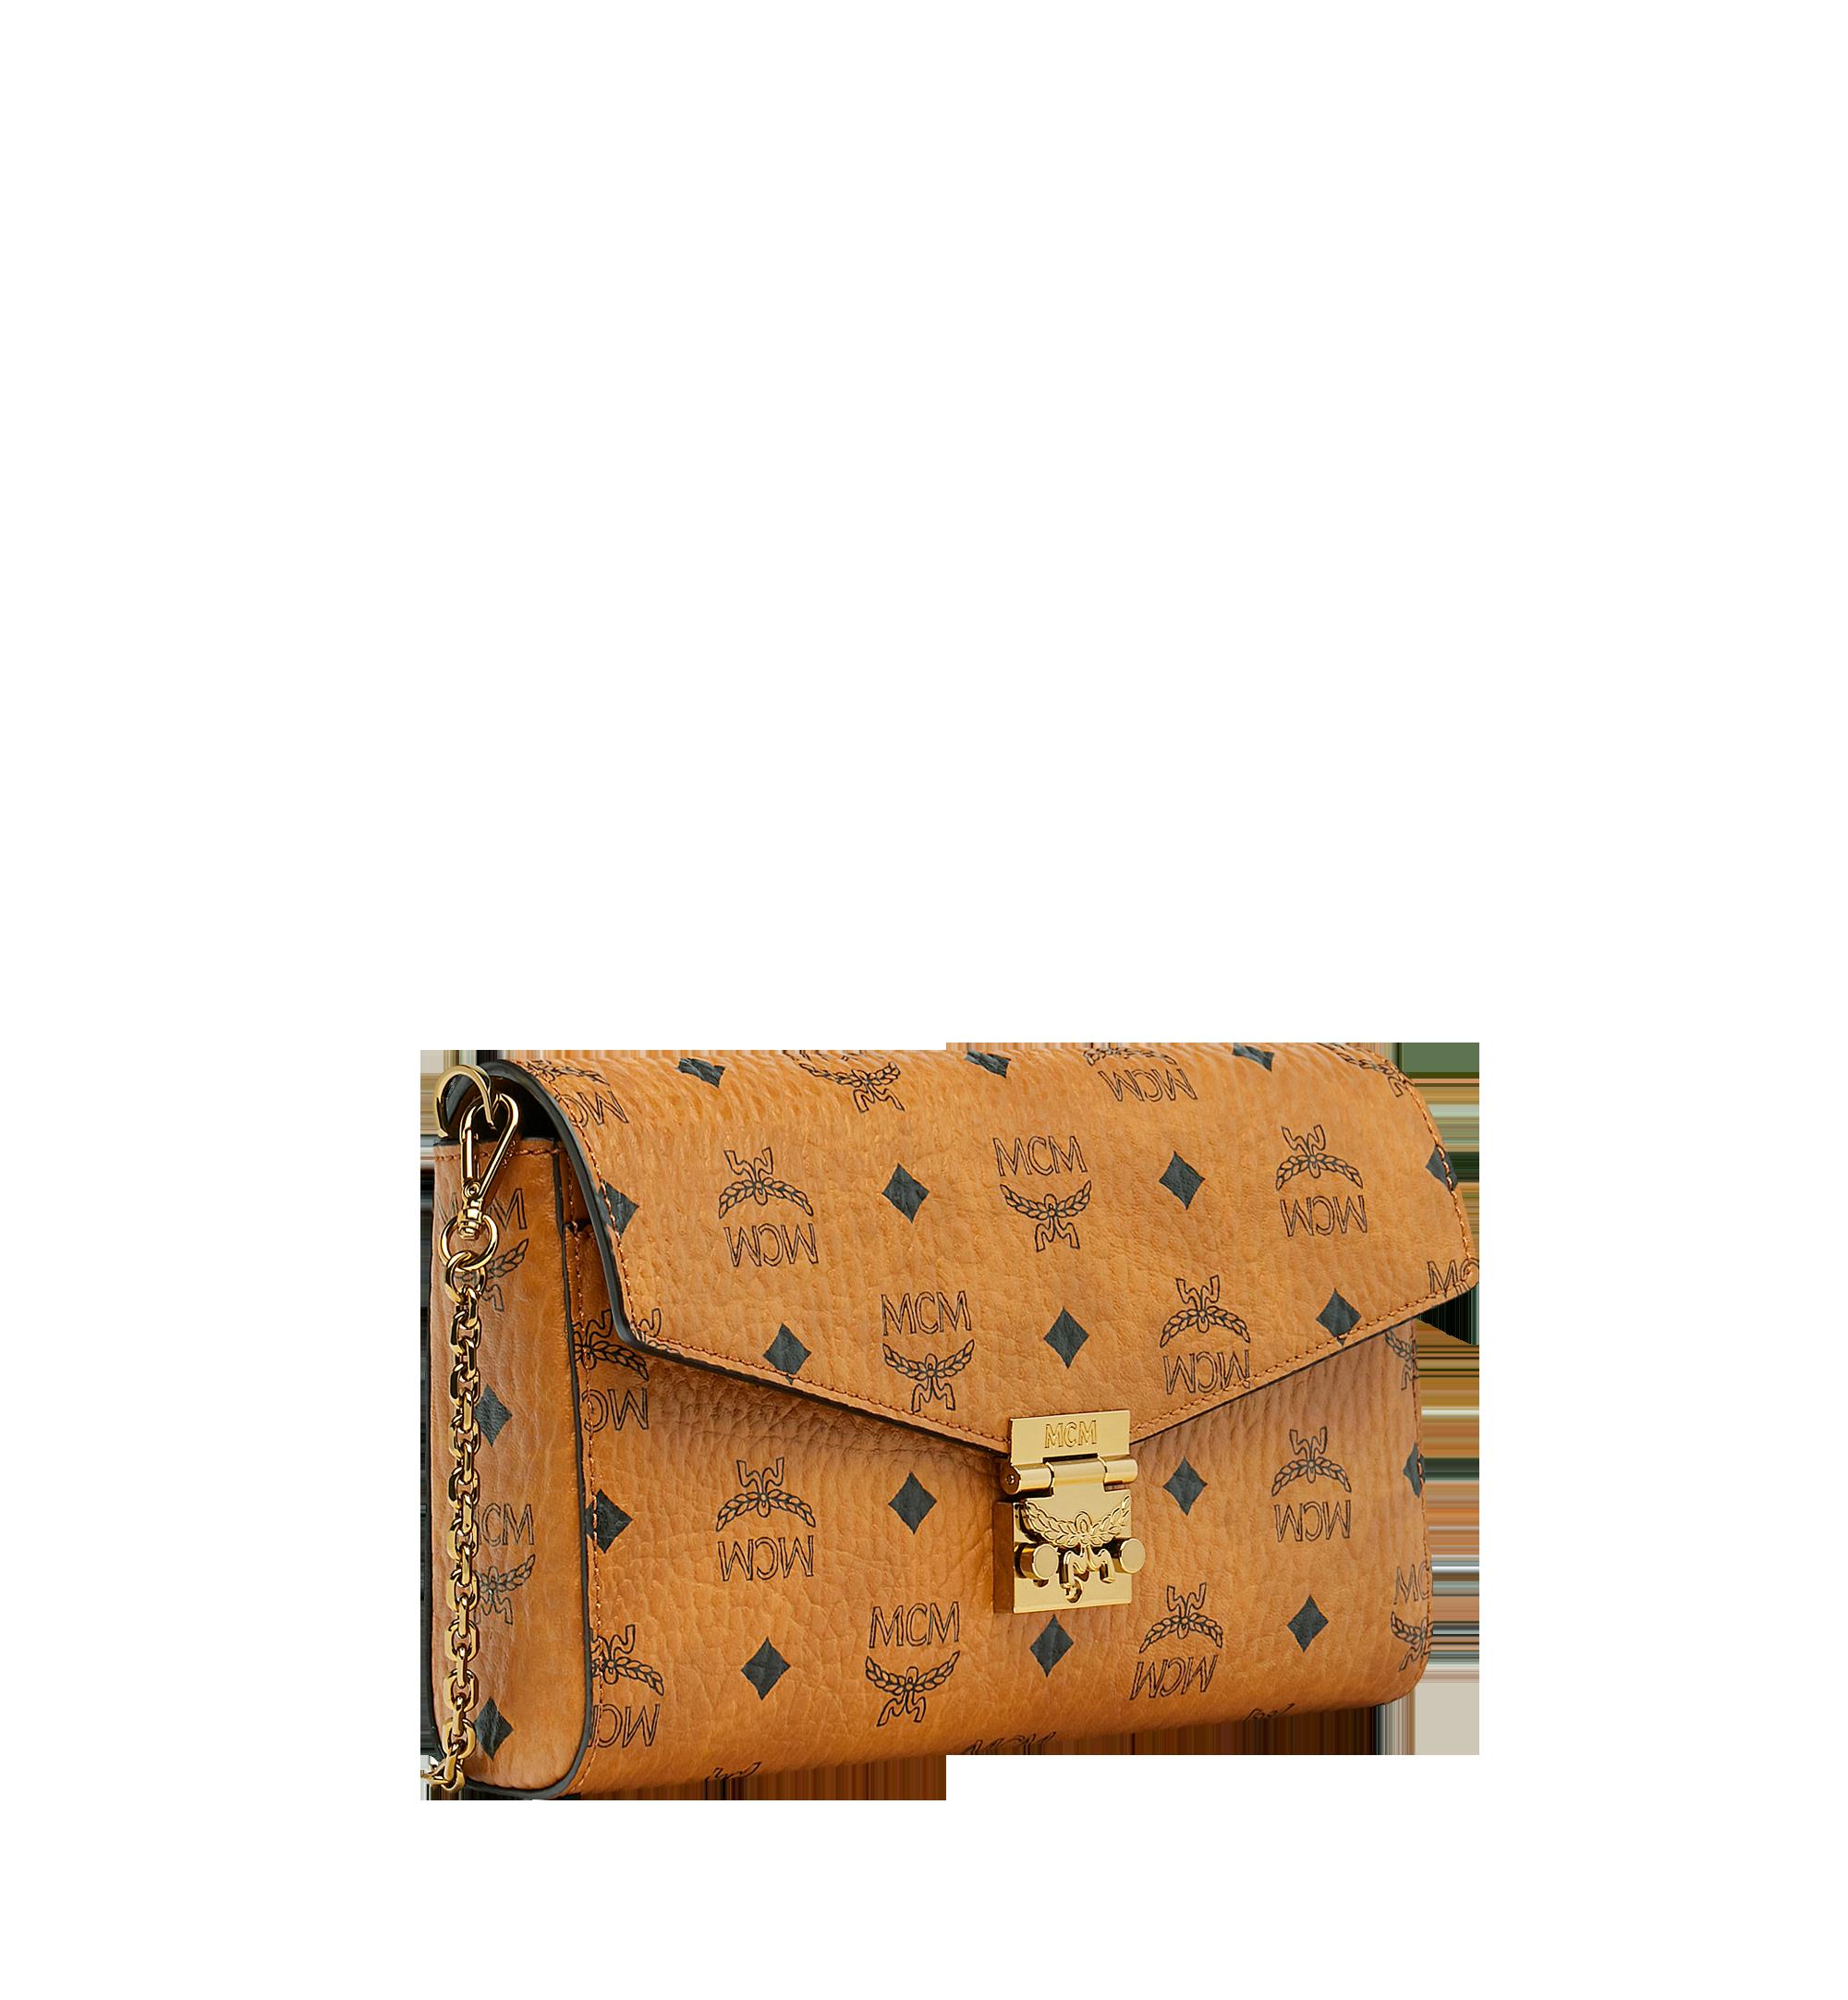 Medium Millie Flap Crossbody Tasche in Visetos Cognac   MCM® DE